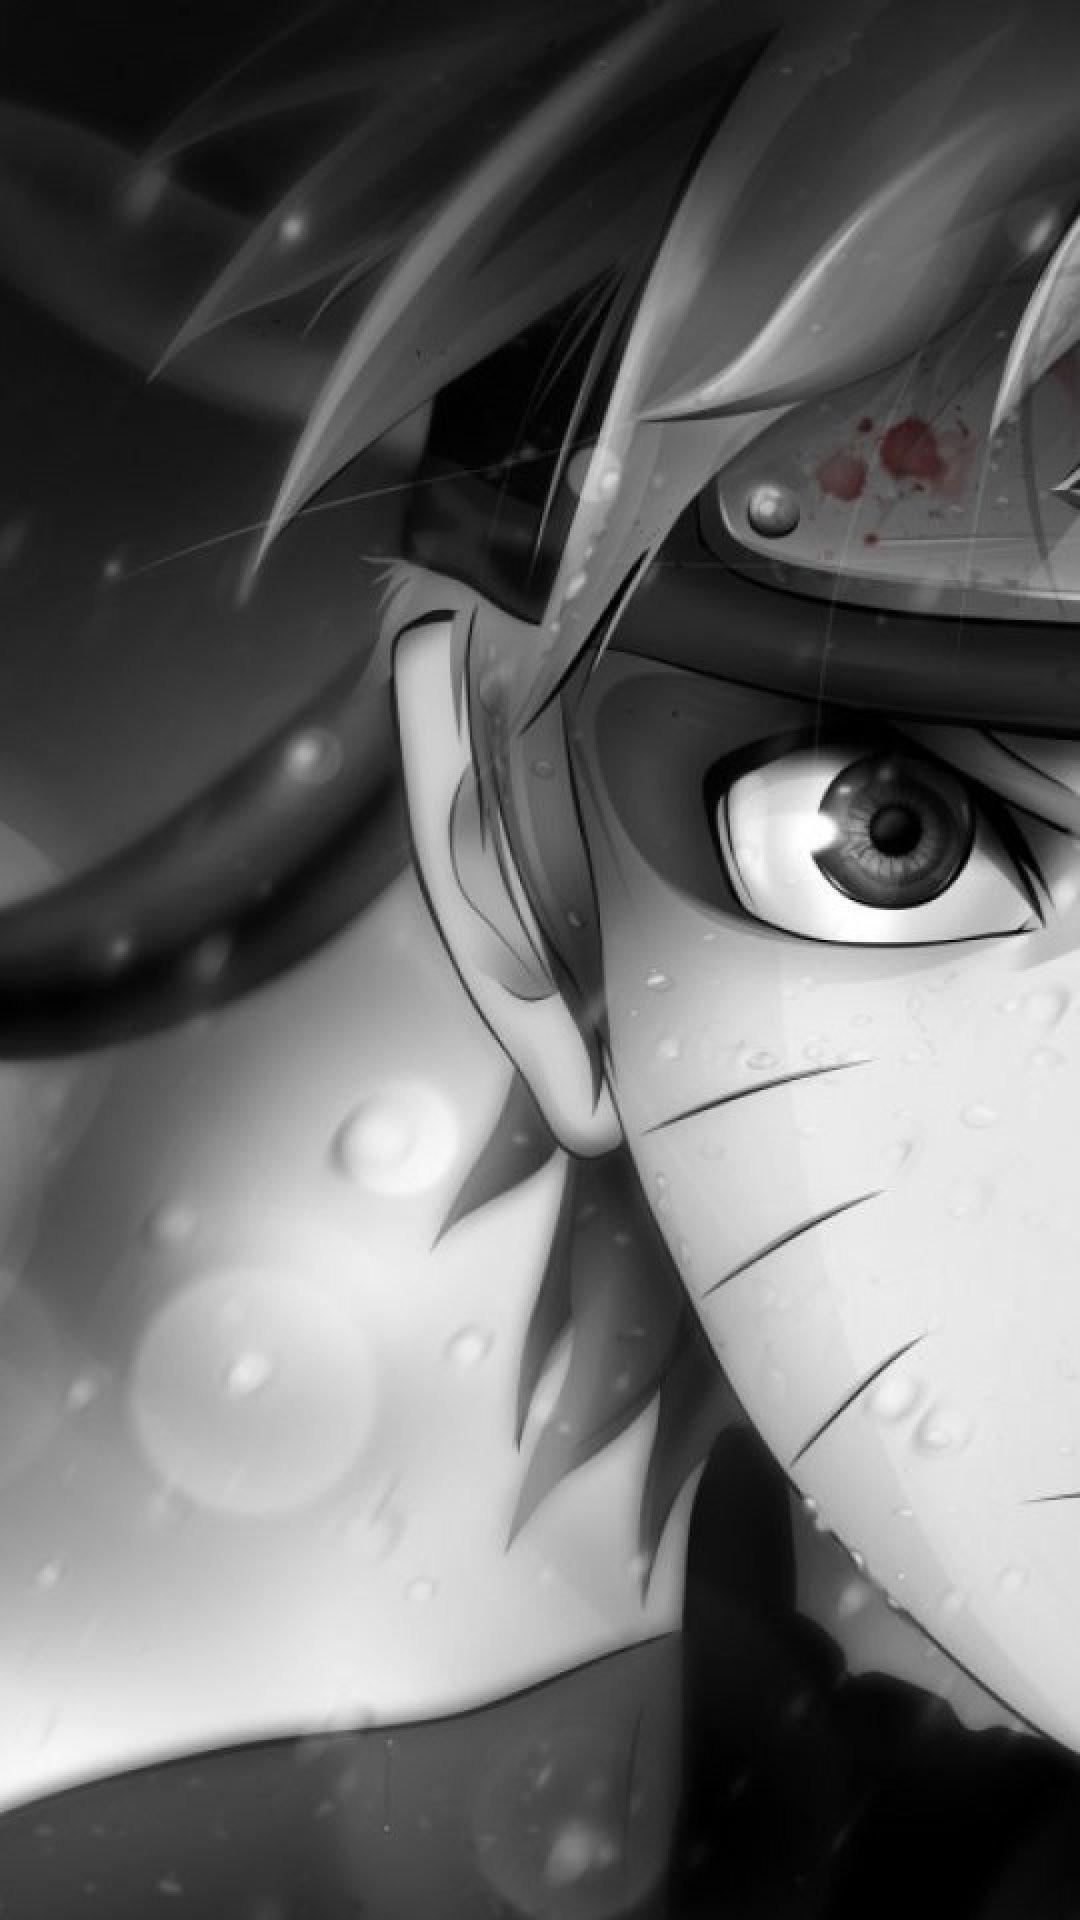 Naruto Iphone Wallpaper Damlafoundation Org